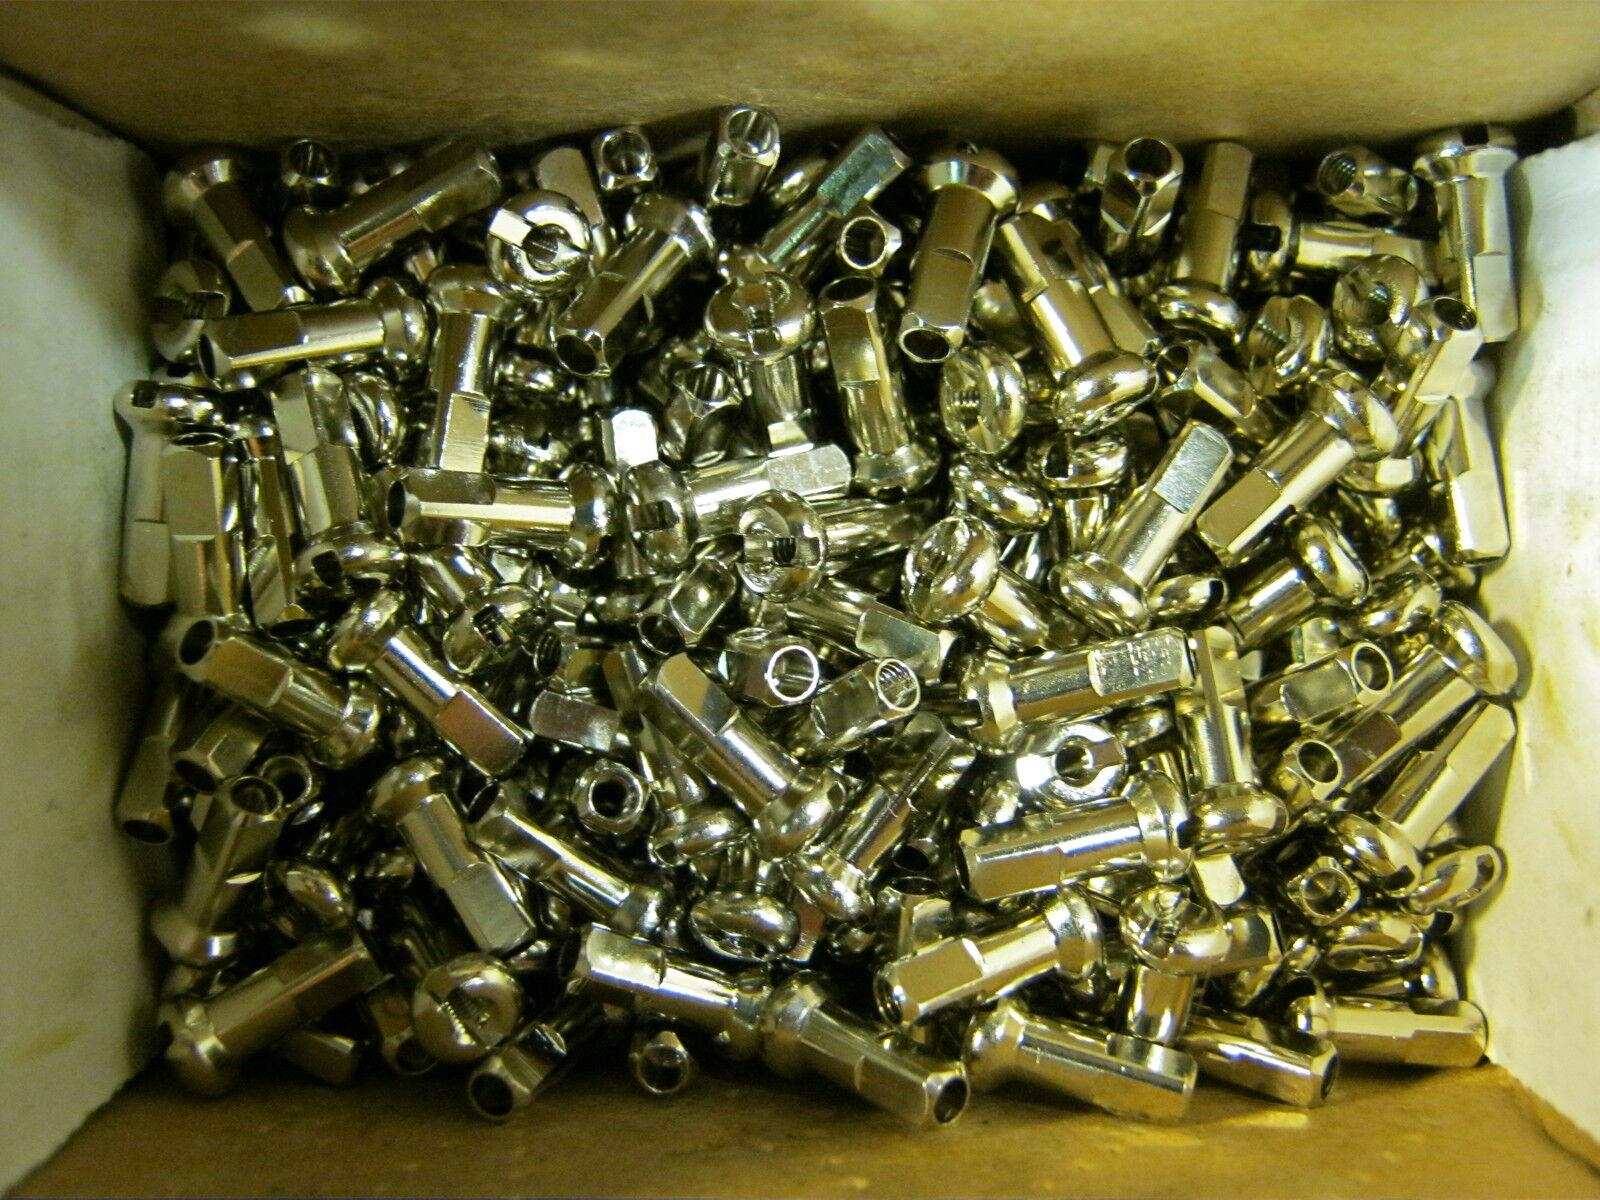 Silver /& Black 12/&16mm *Any Quantity* NEW DT SWISS /& WS BRASS NIPPLES 14 /& 15 g